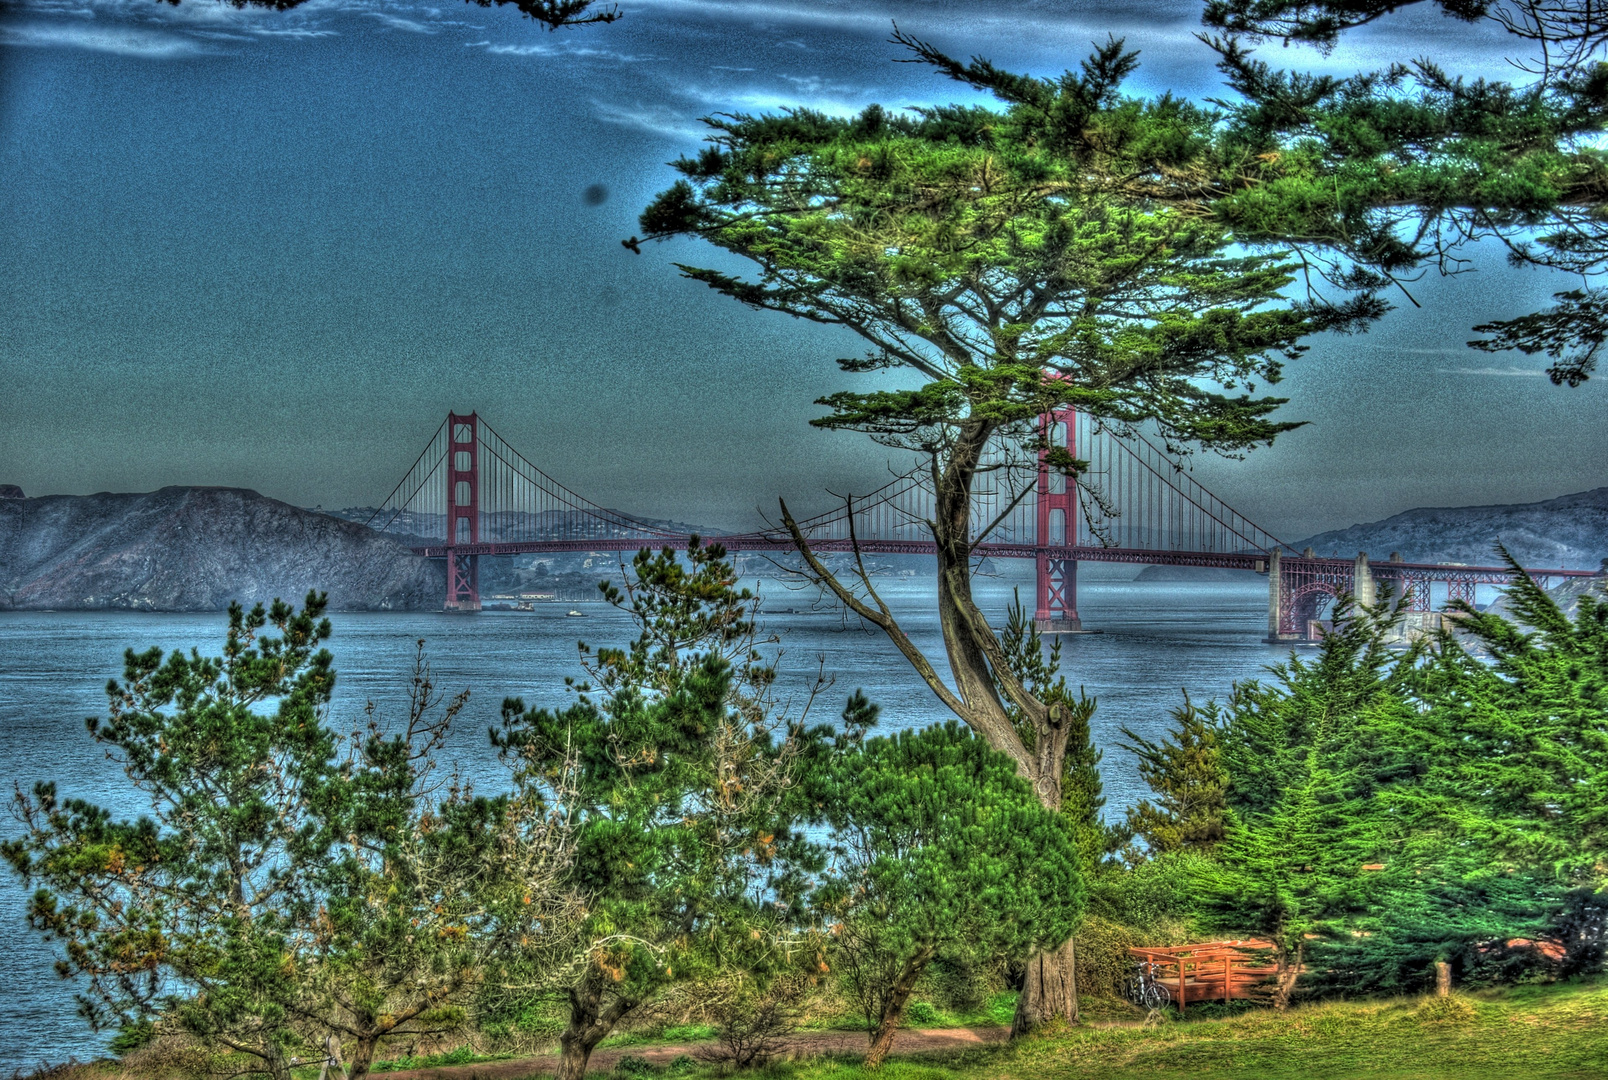 Golden Gate SFO